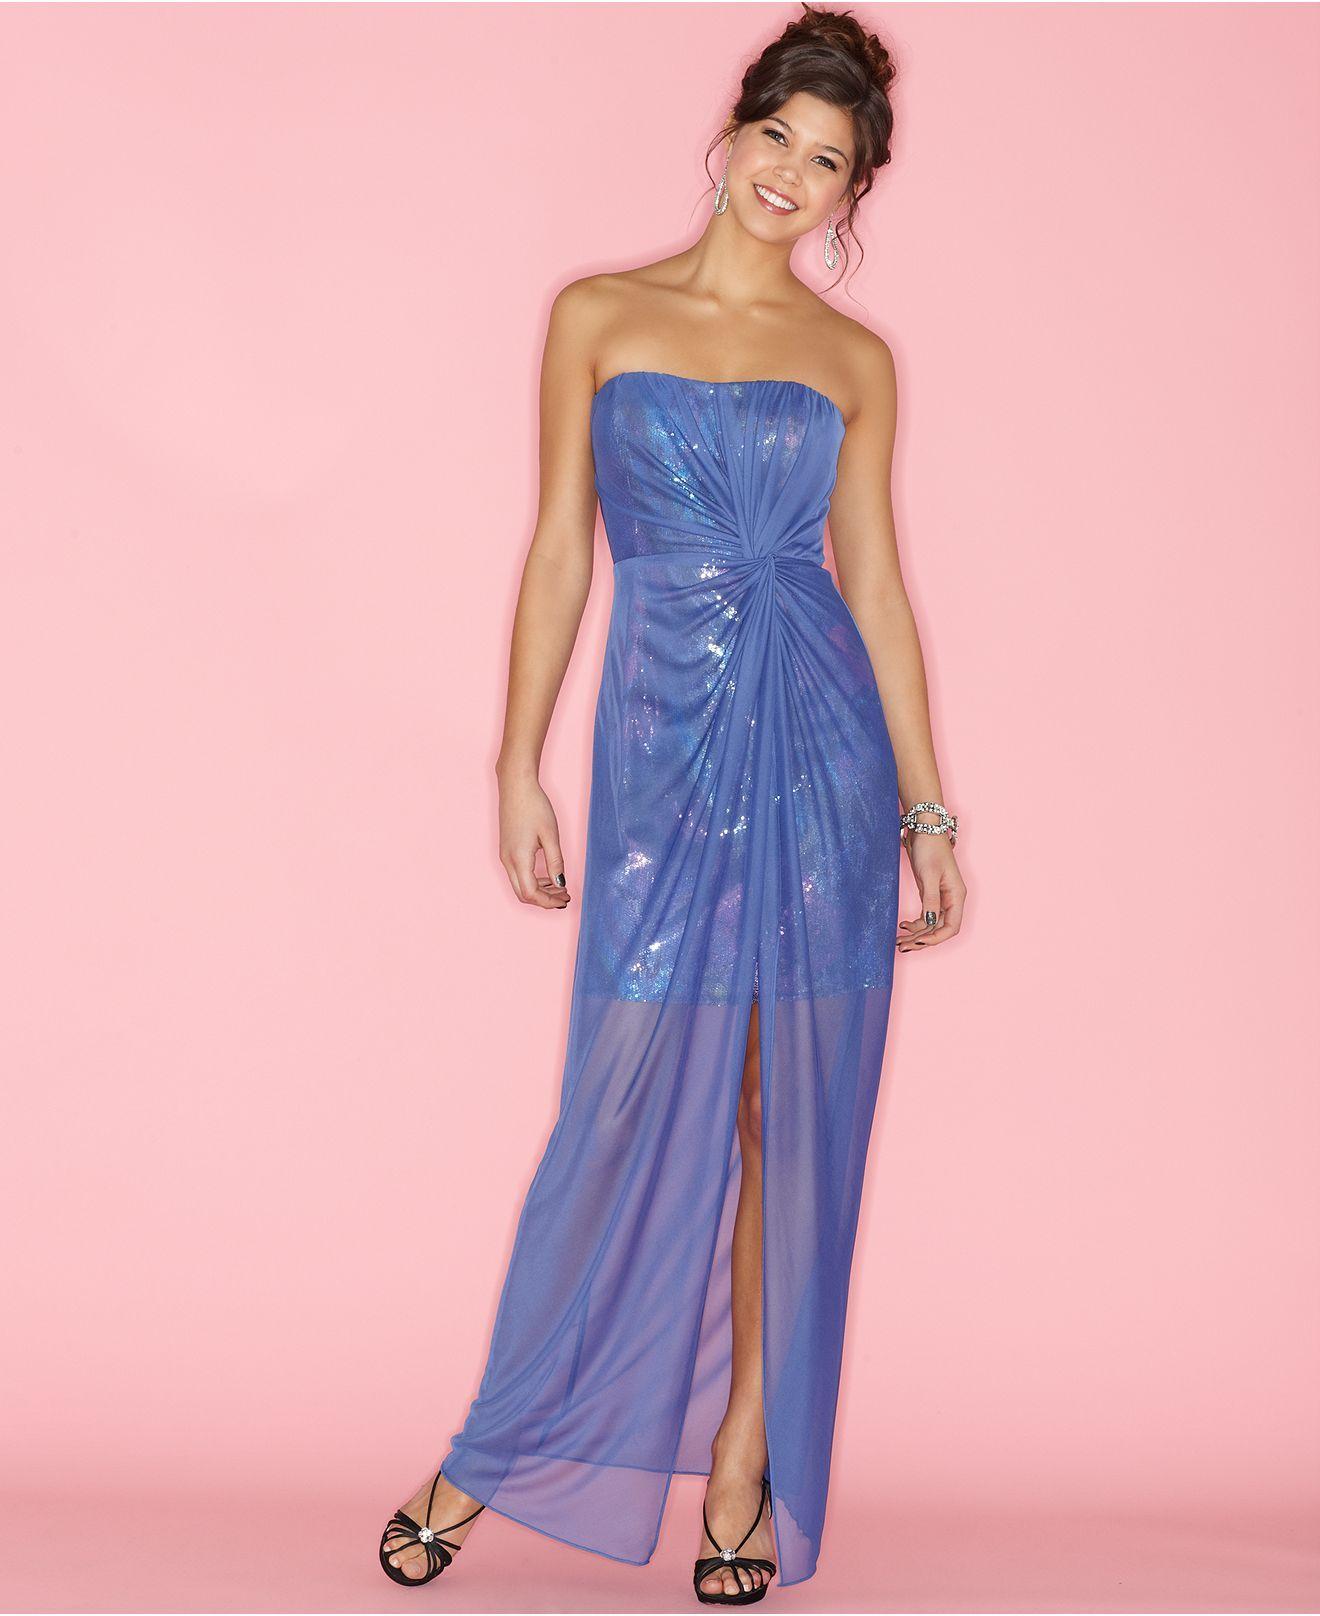 Contemporáneo Vestidos De Fiesta Hailey Logan Ideas Ornamento ...